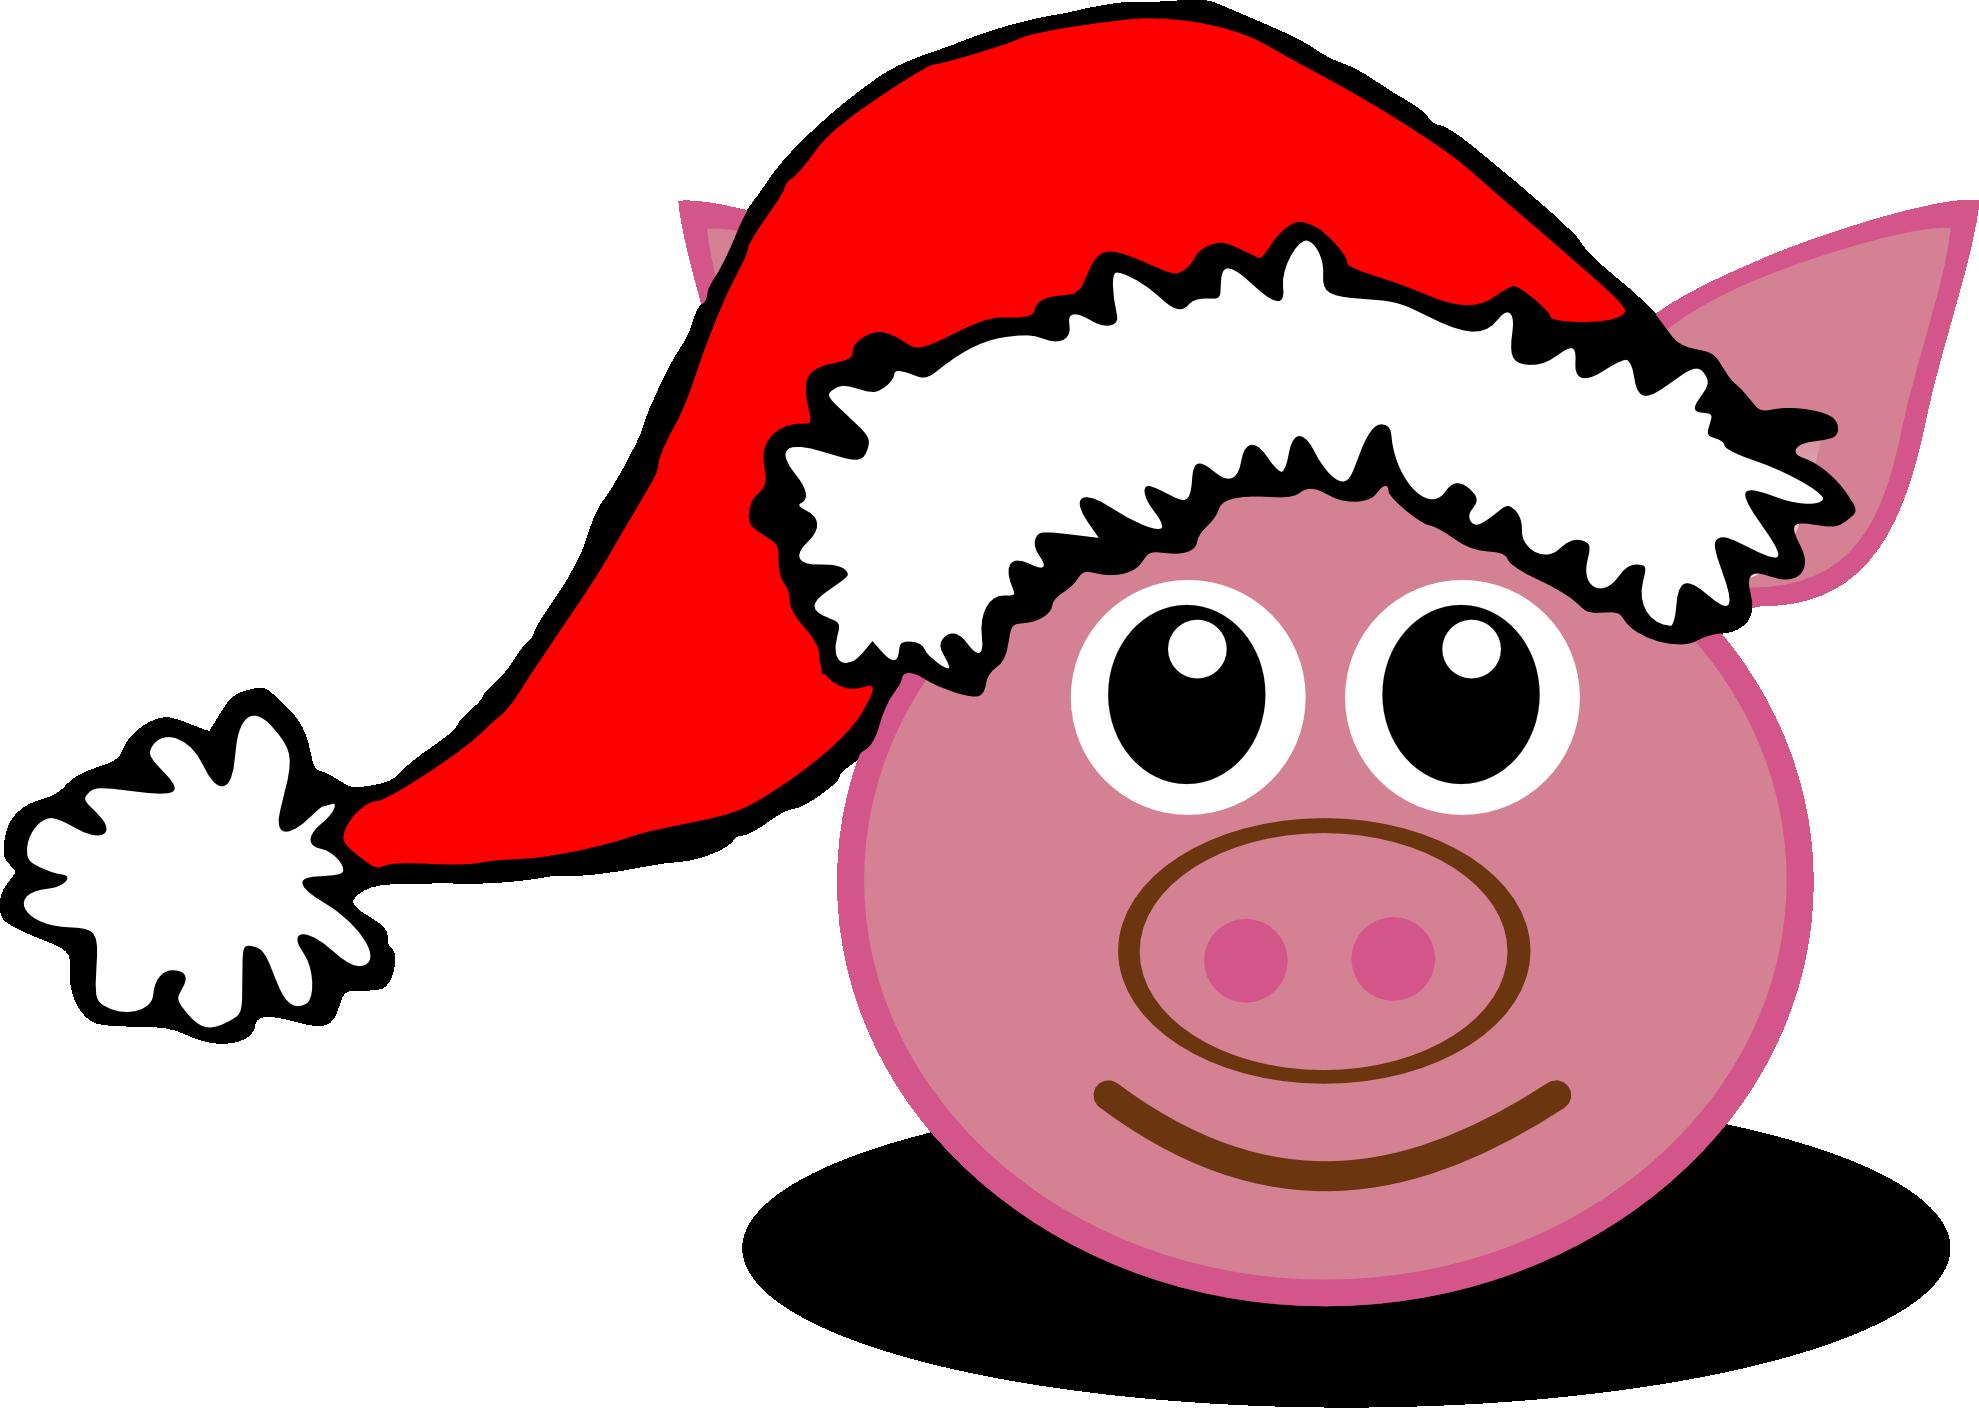 clipartist pluspng.com » Clip Art » palomaironique pig face cartoon pink - Pig Face PNG HD